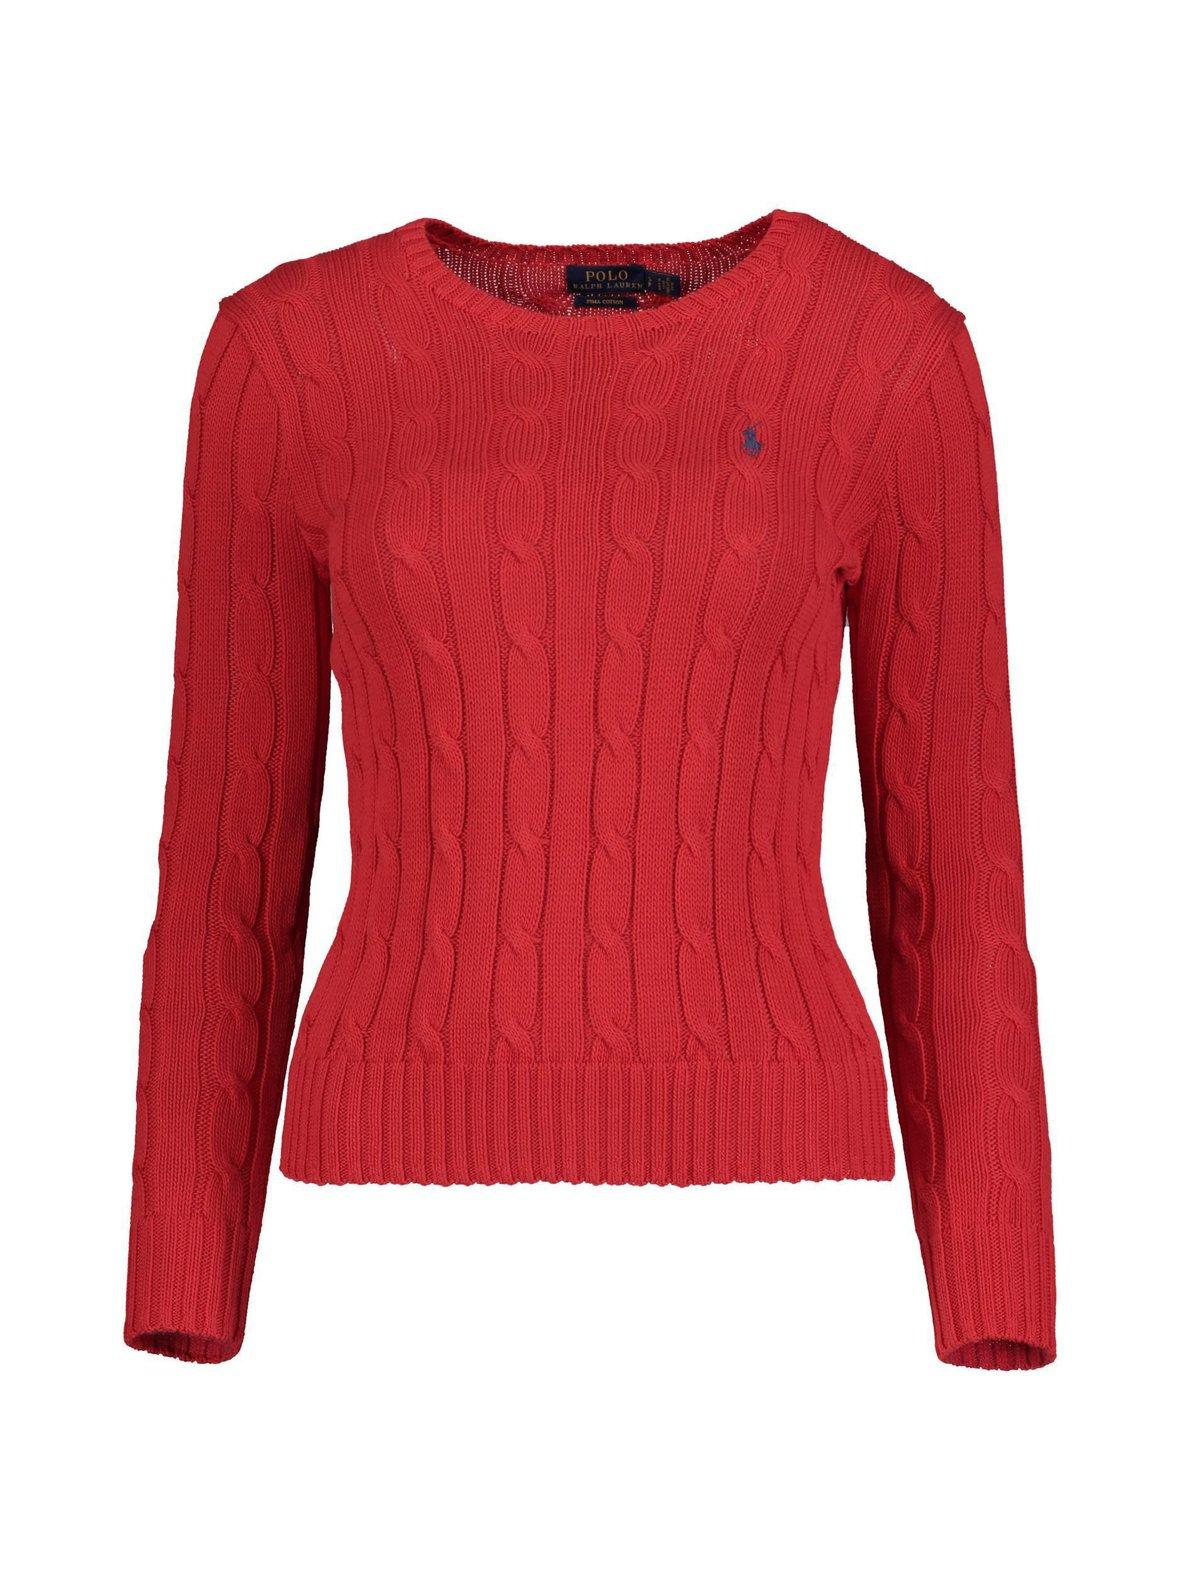 Martin Red (punainen) Polo Ralph Lauren Cotton Classic Cable -neule ... b0d4278d97